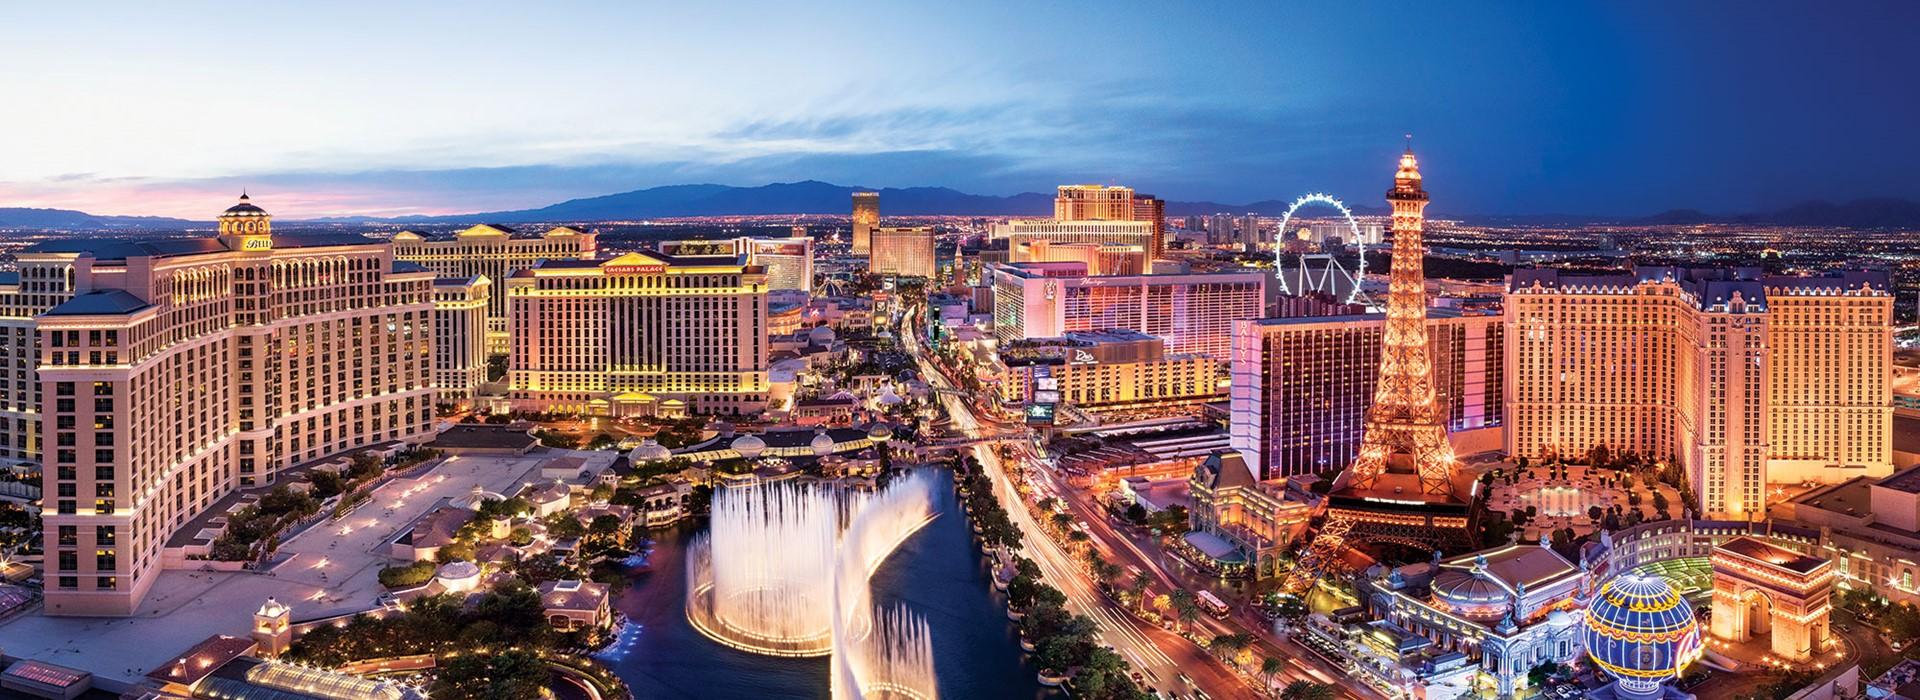 Hollywood, Vegas & the Grand Canyon